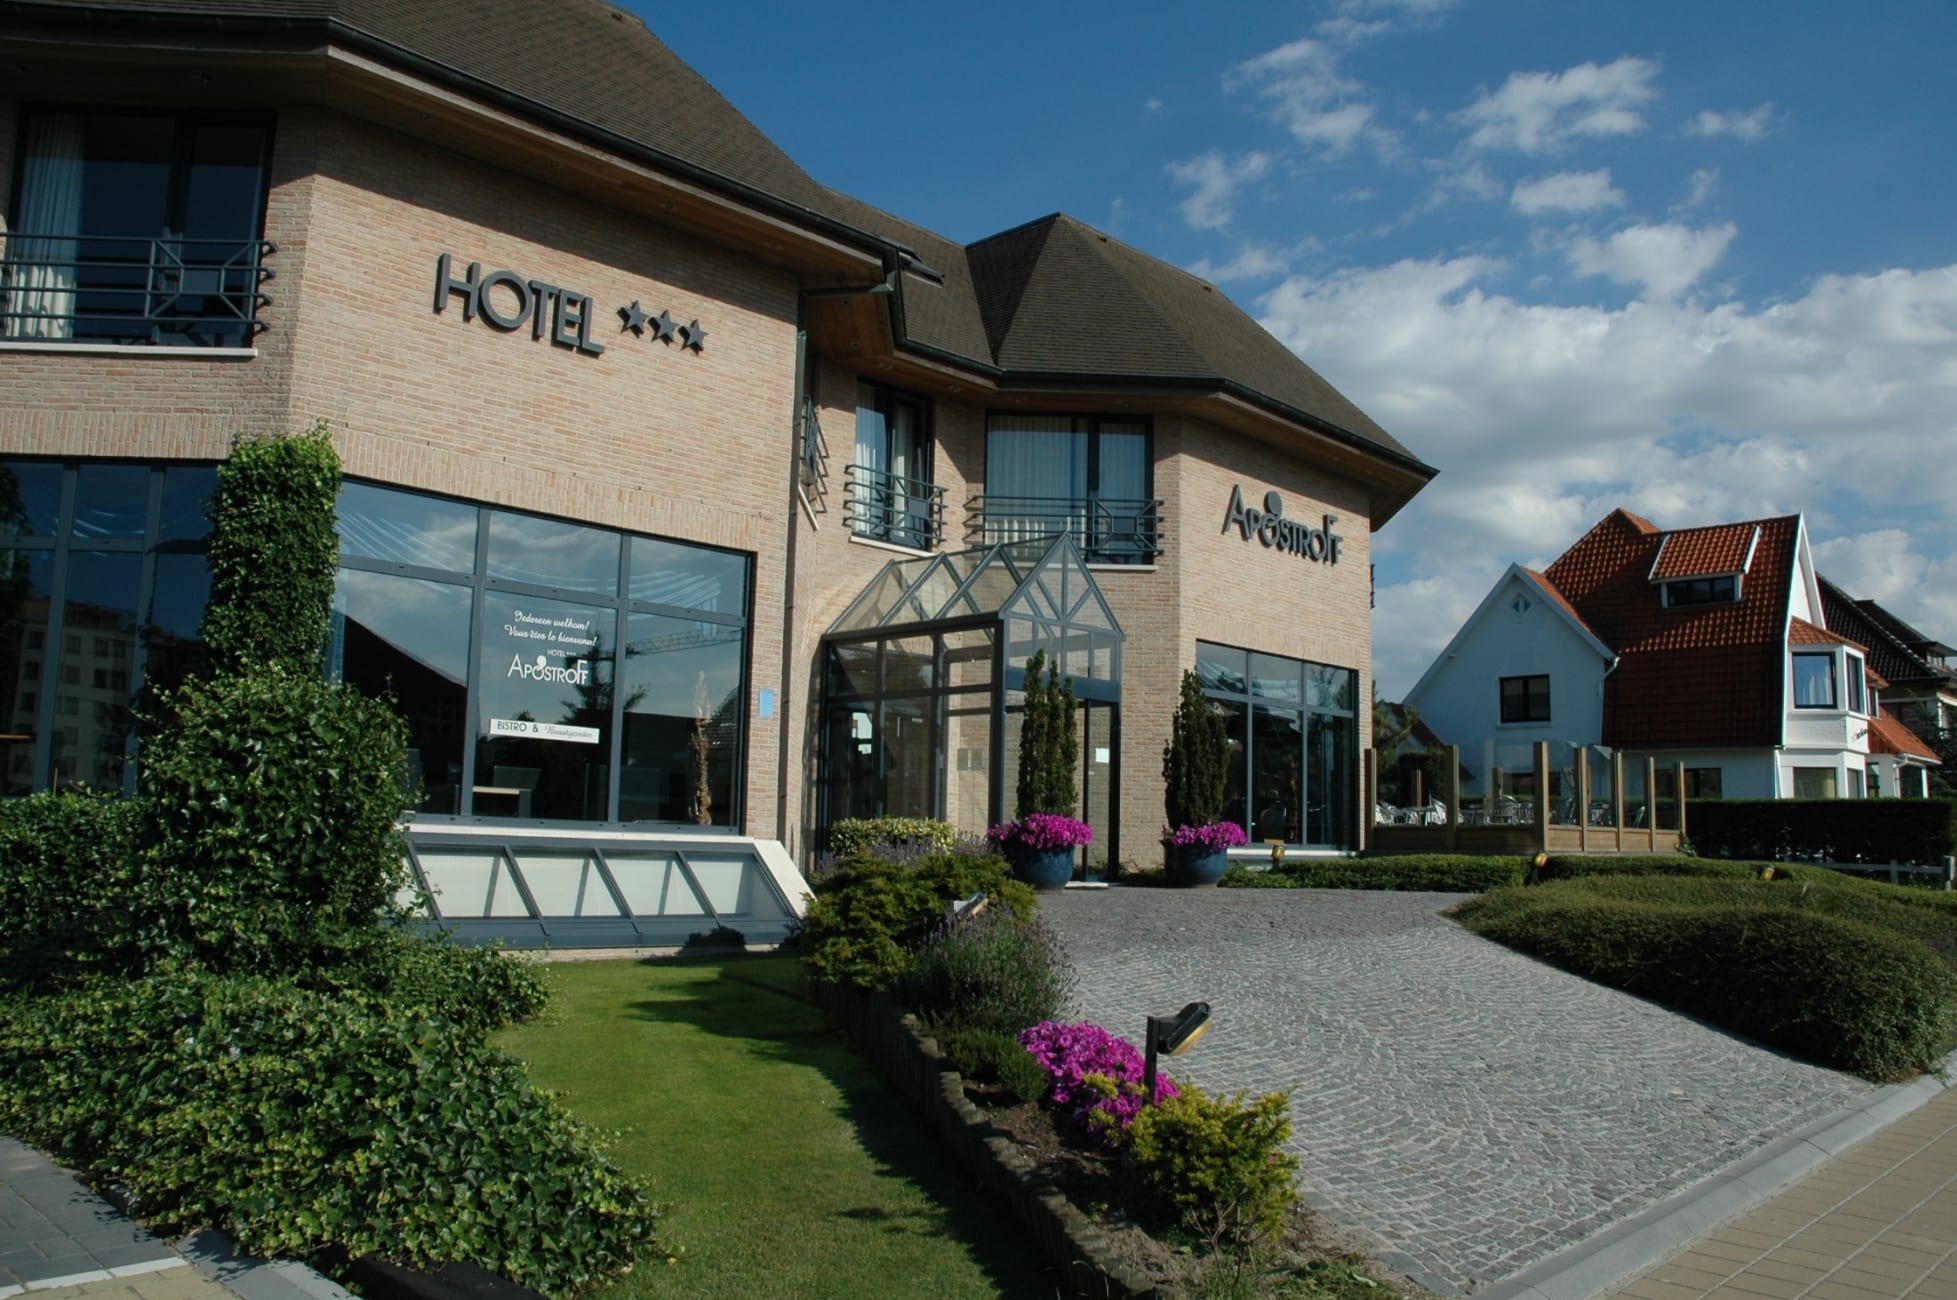 Hôtel Hotel Apostroff, Koksijde - Trivago.be tout Piscine Coxyde